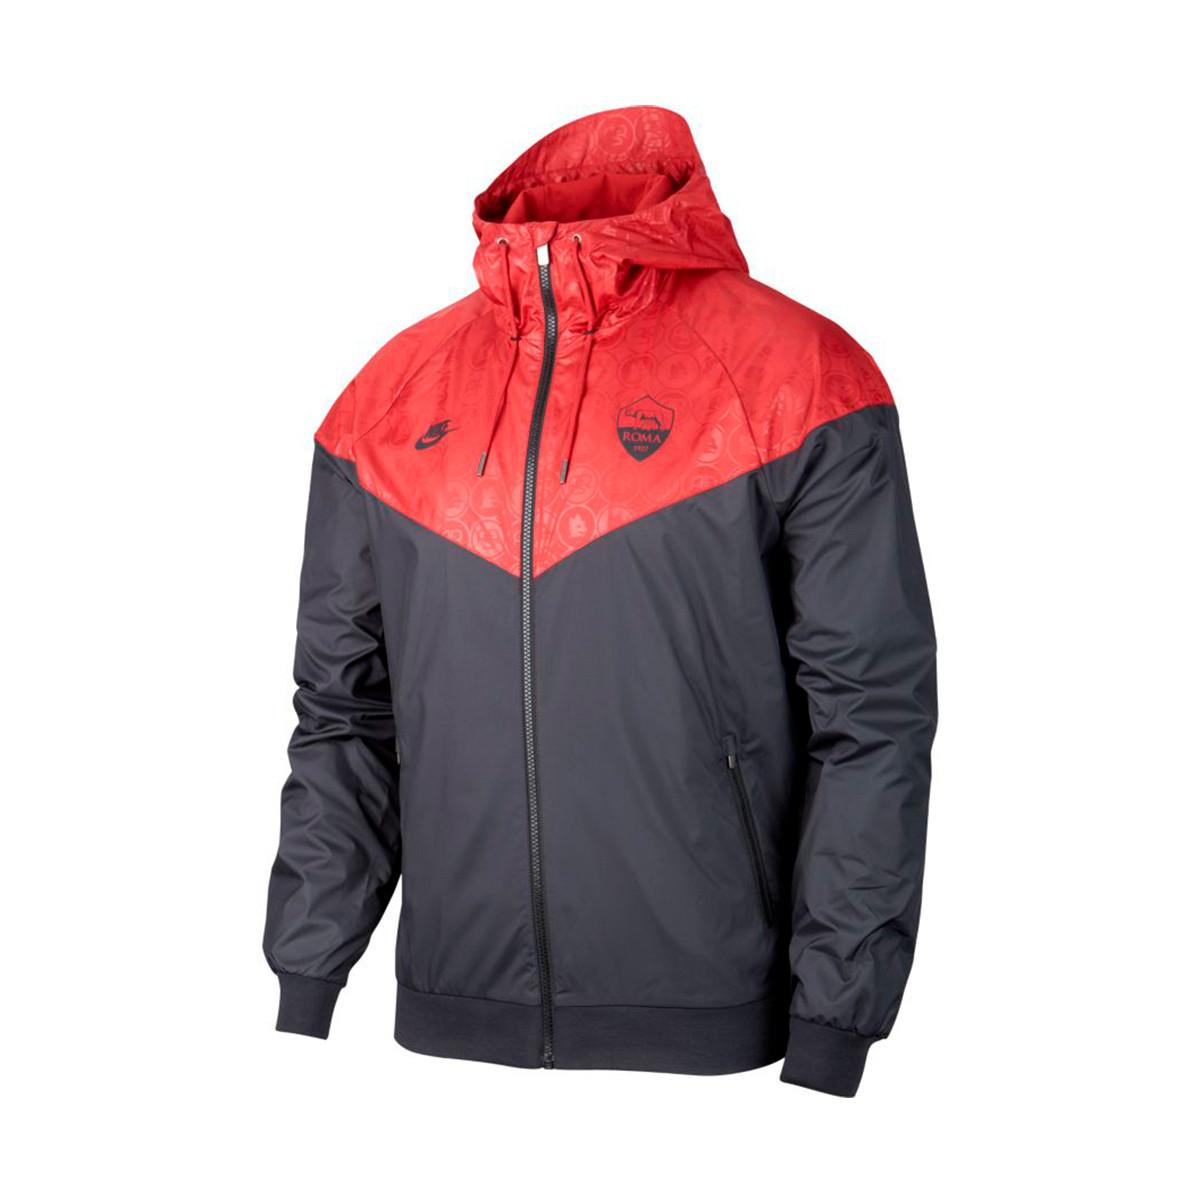 AUT Chaqueta Nike AS Roma CL 2019 NSW 2020 Woven g76Ybvfy